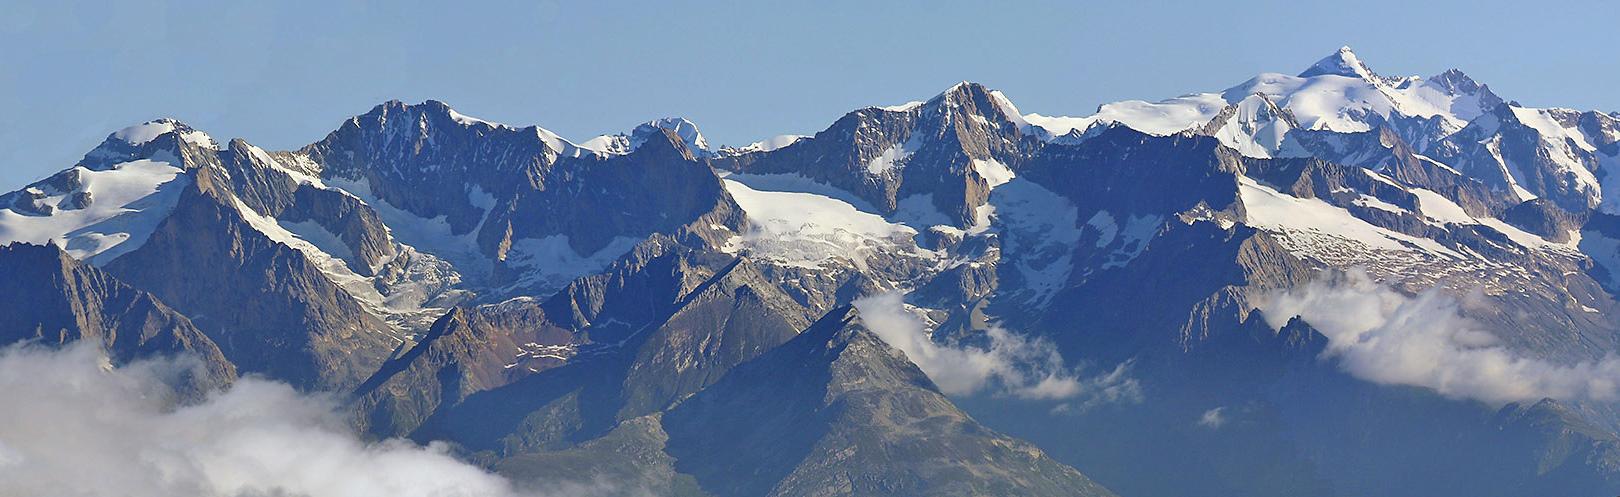 Gipfel über Gipfel